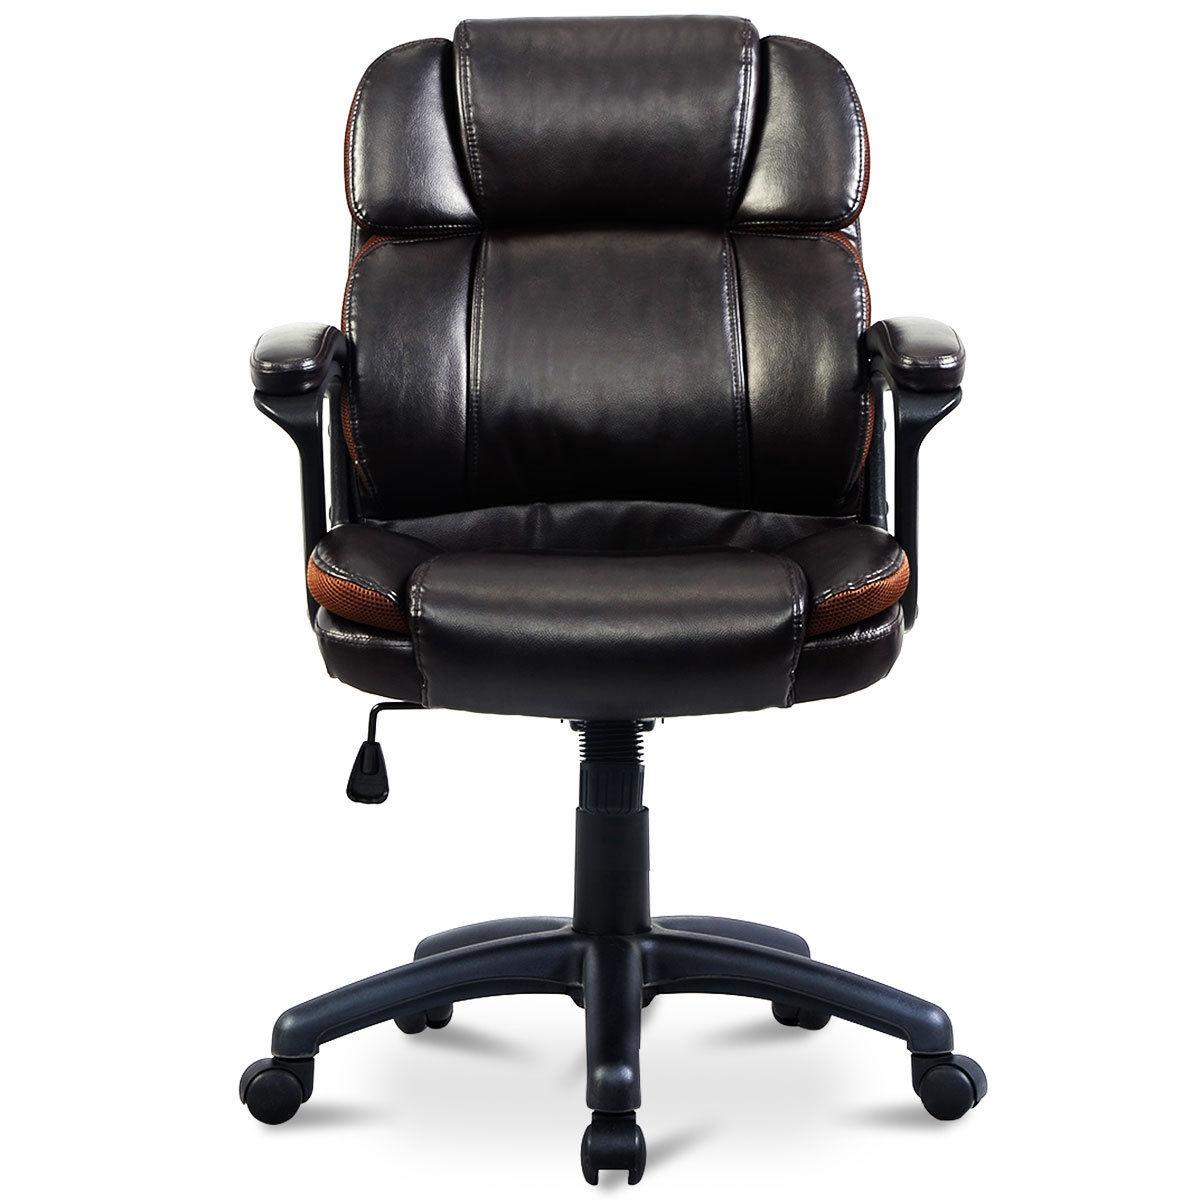 Dark Brown Ergonomic Mid-Back Office Chair